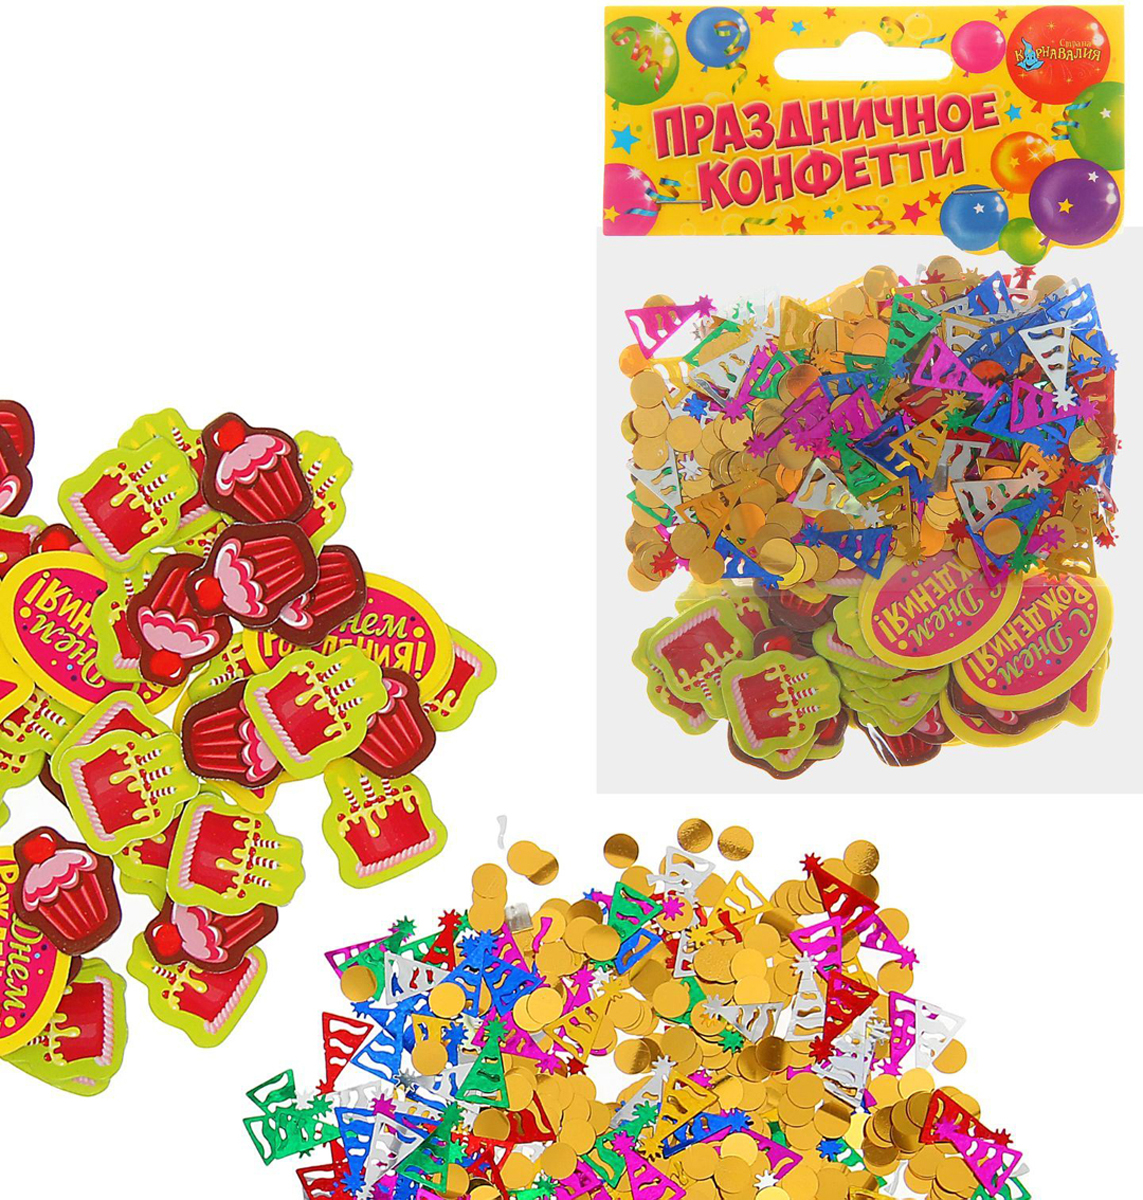 Страна Карнавалия Конфетти С днем рожденитортики набор 2 пакета + бумажное конфетти 1134844